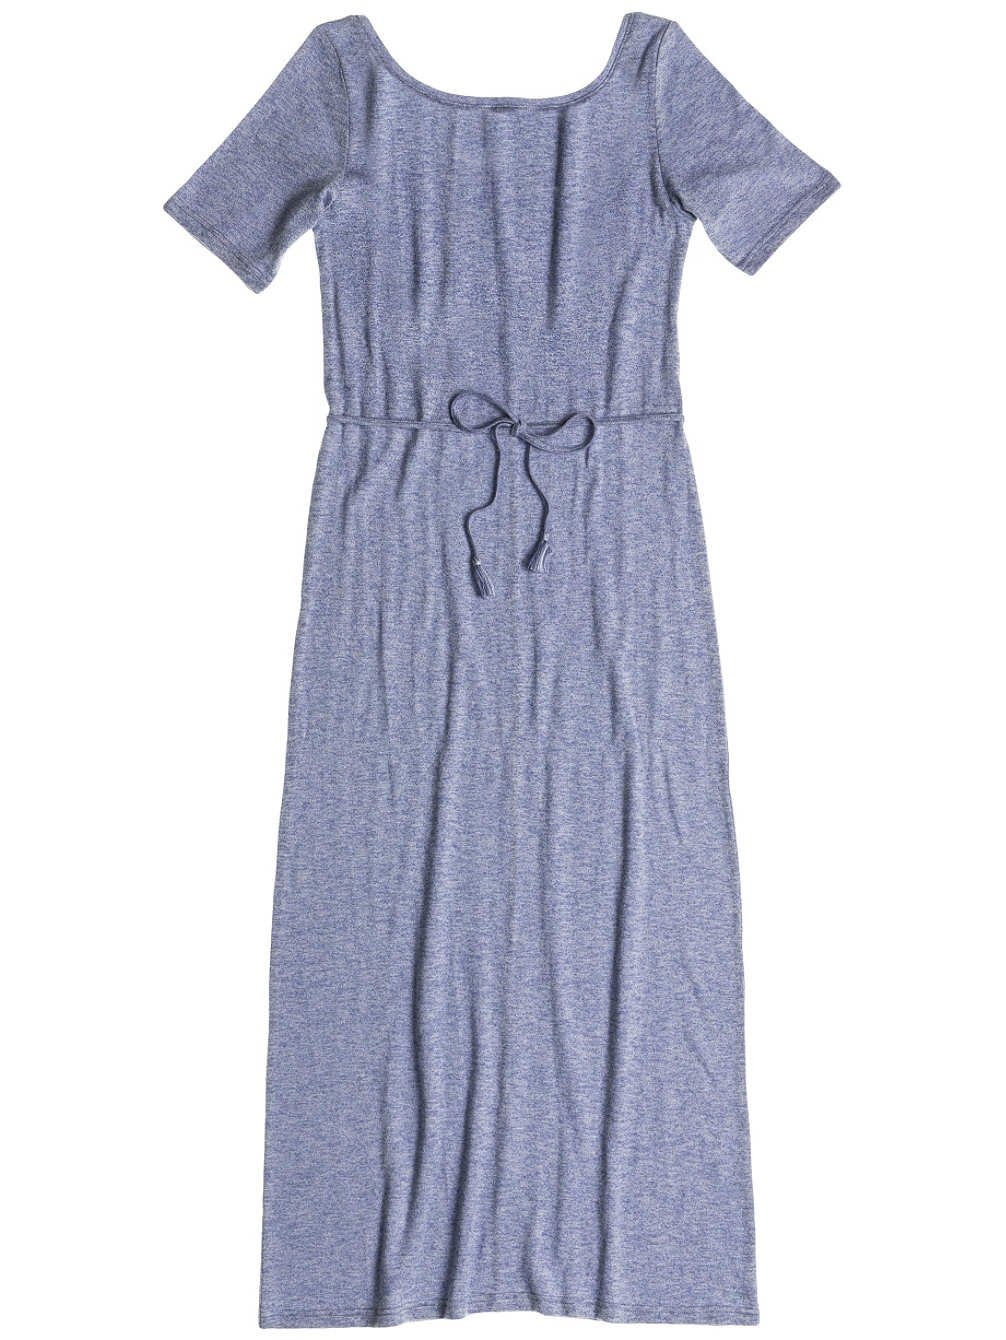 Roxy Making Time Dress–Light Denim